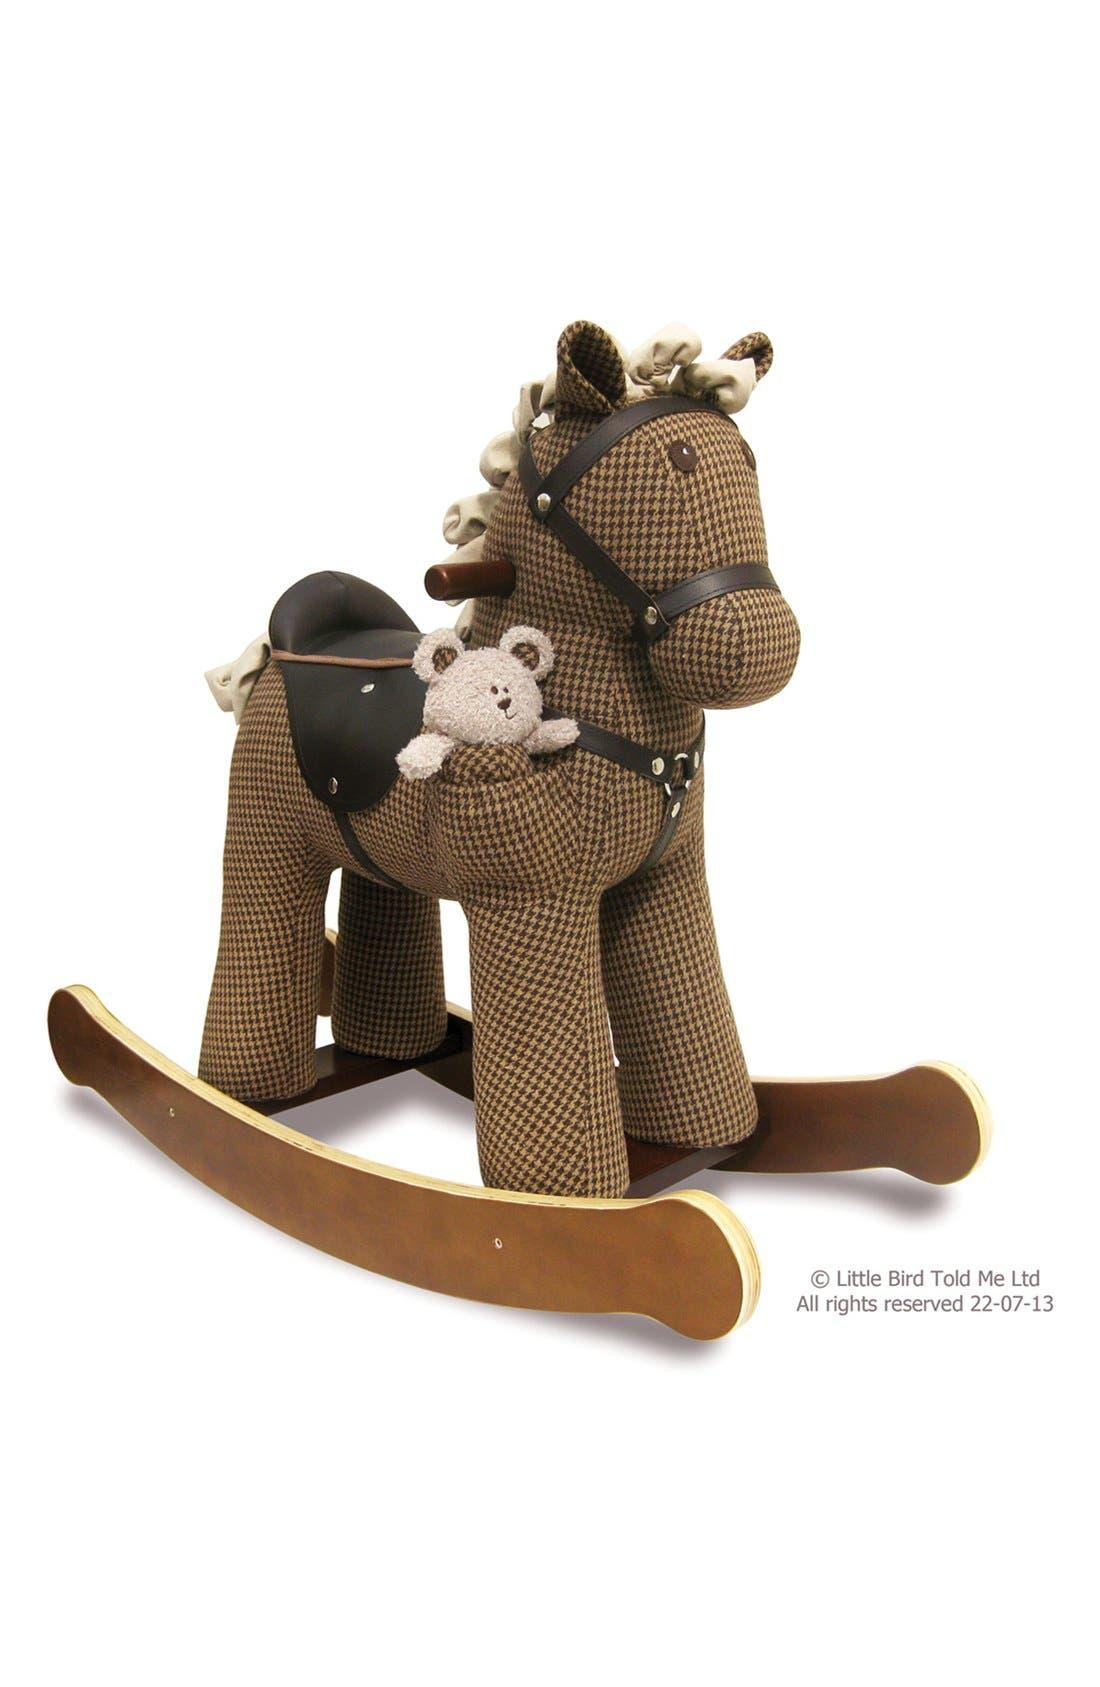 Little Bird Told Me Rocking Horse & Stuffed Animal